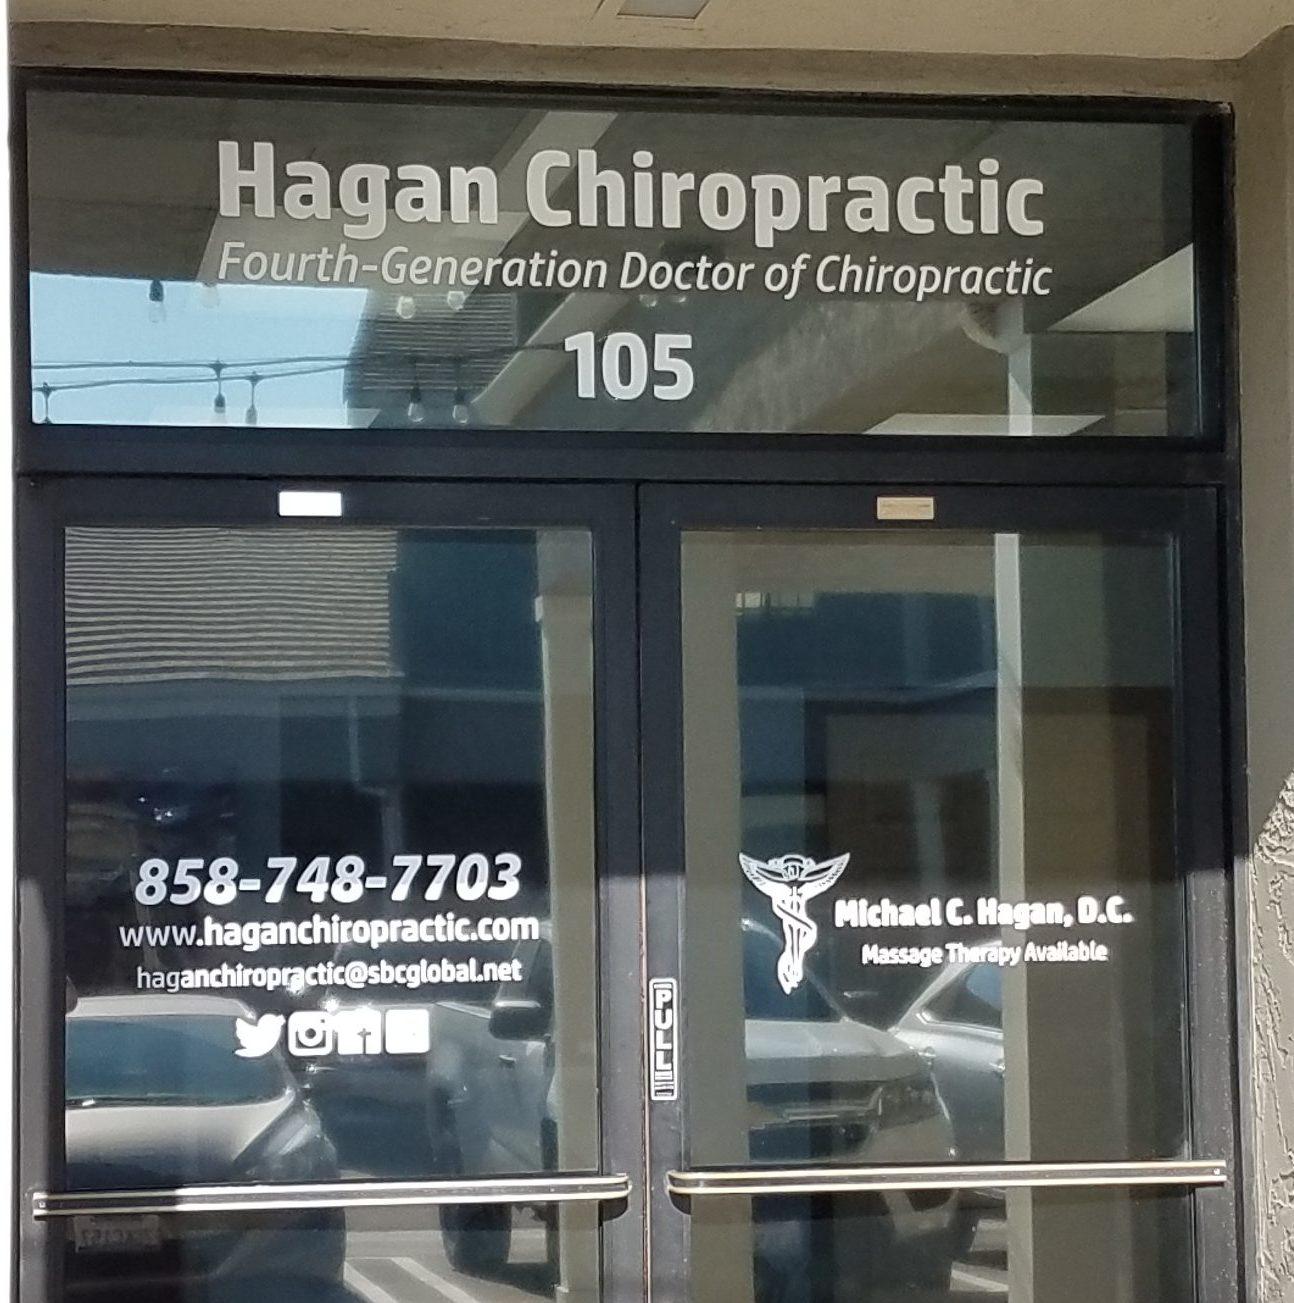 Hagan Chiropractic